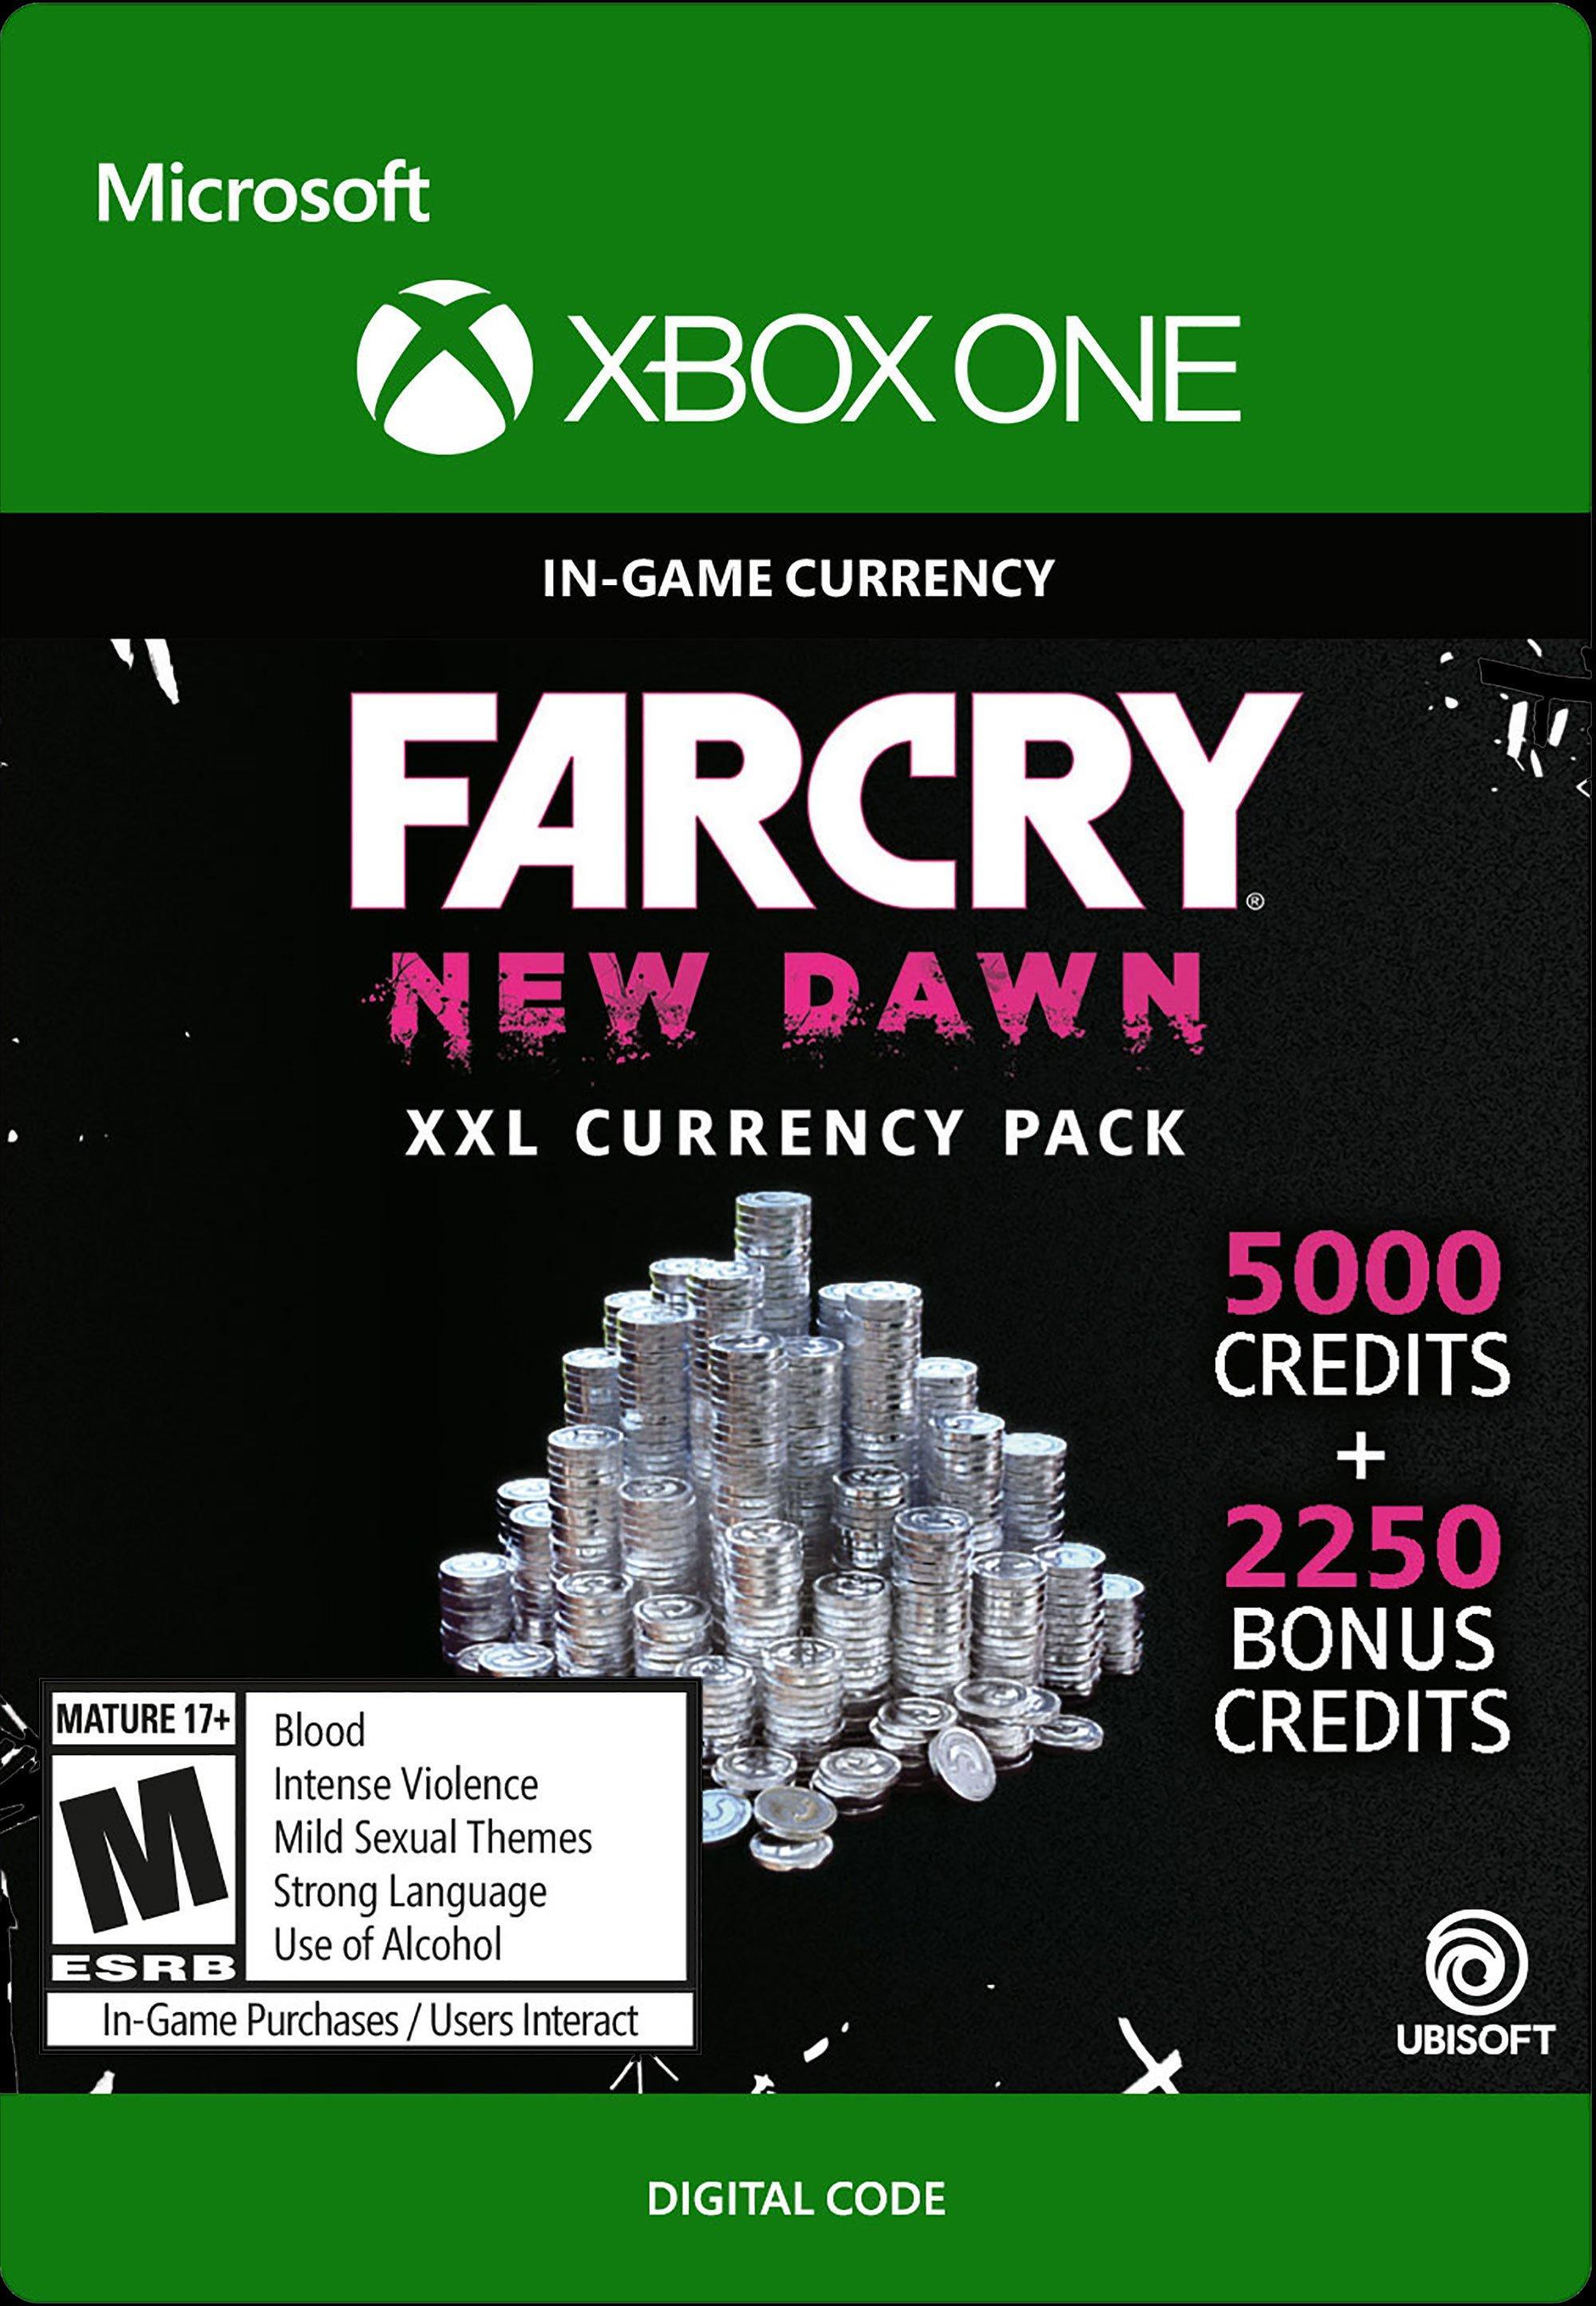 Far Cry New Dawn Xxl Currency Pack Xbox One Gamestop